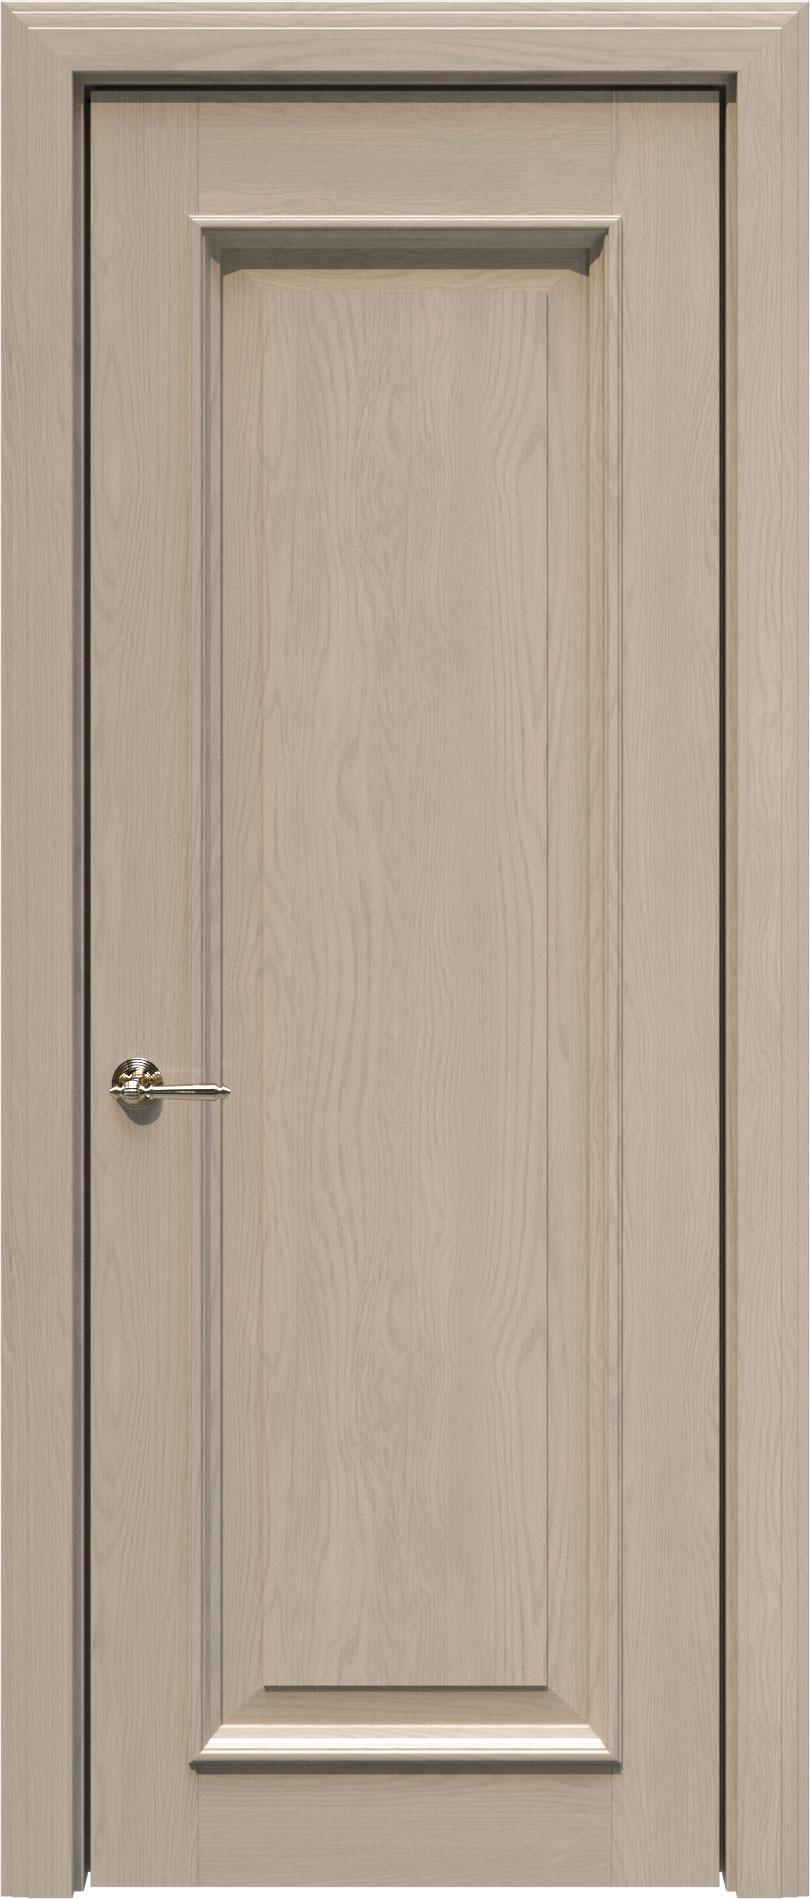 Domenica LUX цвет - Дуб муар Без стекла (ДГ)